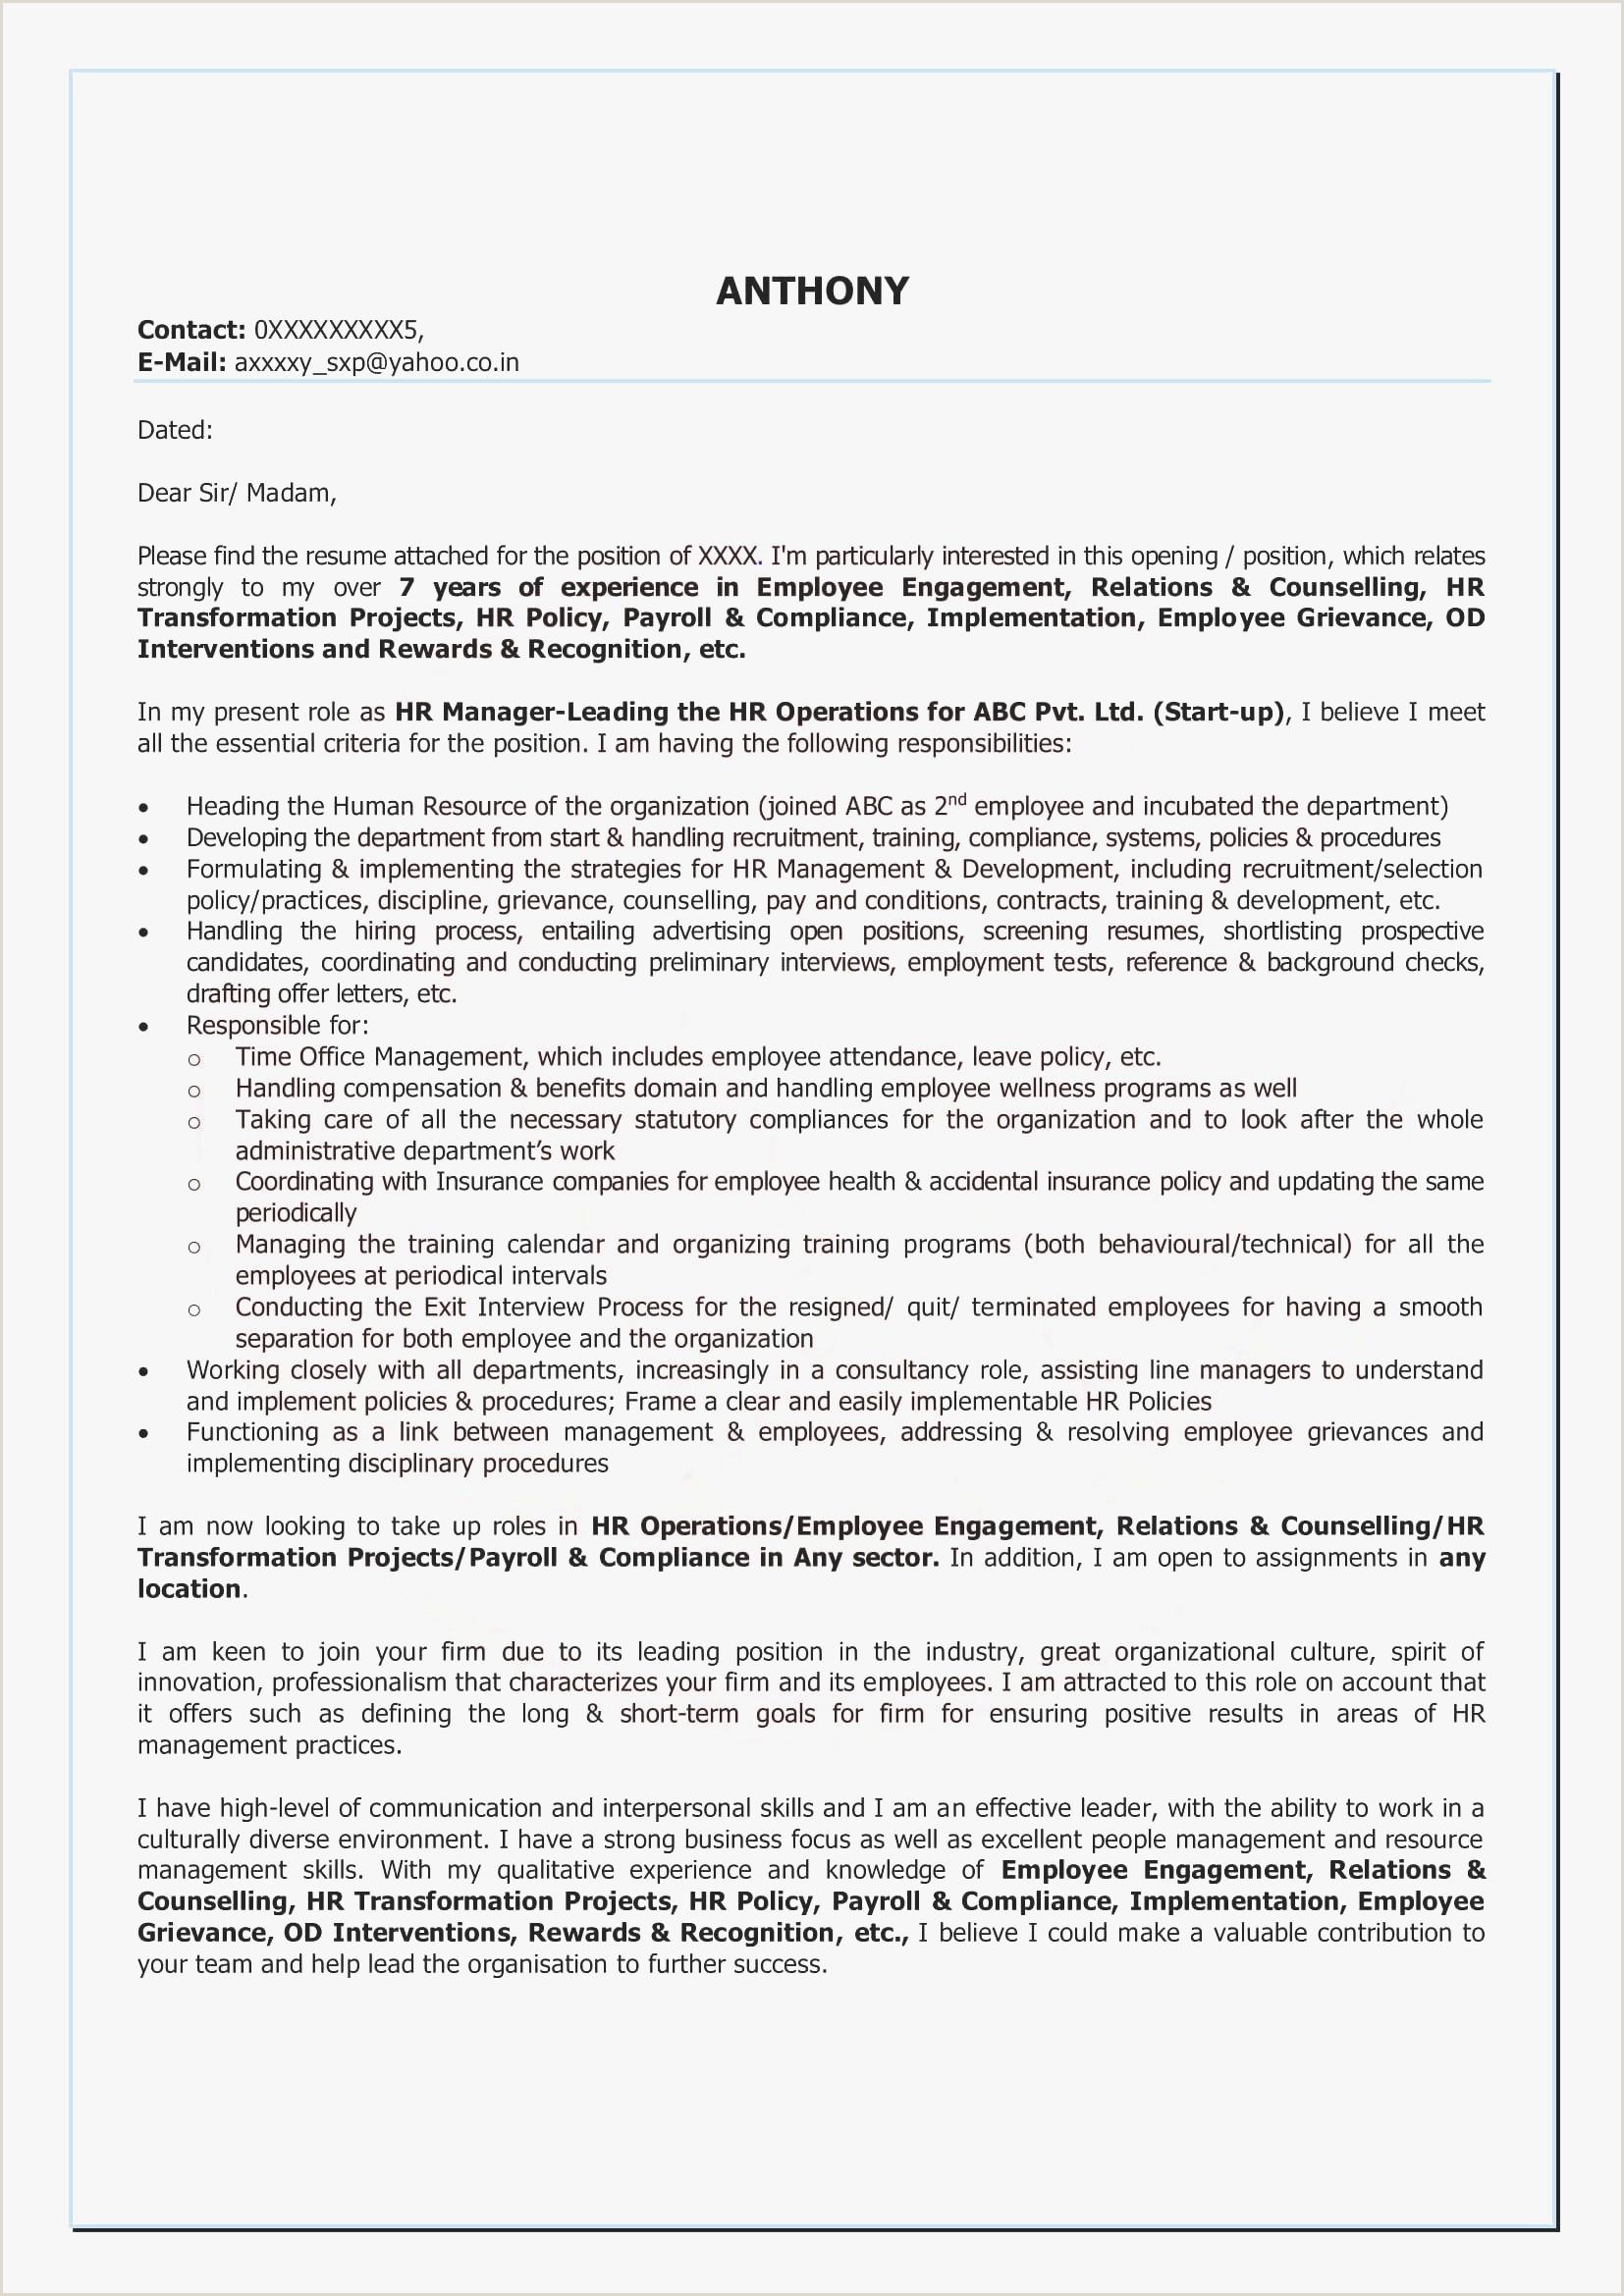 Curriculum Vitae Sample In Pdf Valid Resume Cover Letter